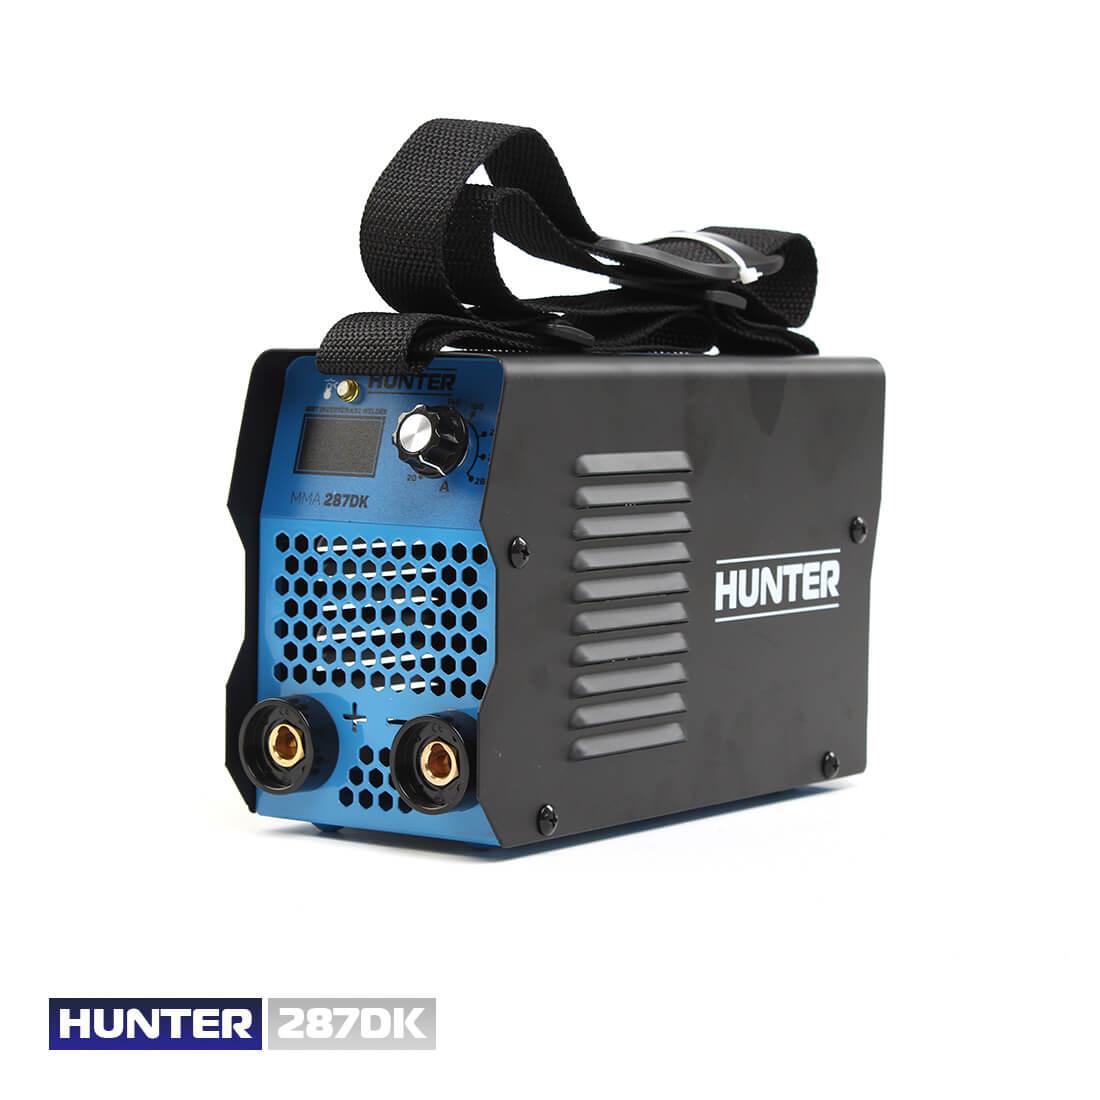 Фото Hunter MMA 287DK (дуговая) цена 2550грн №7 — Hunter